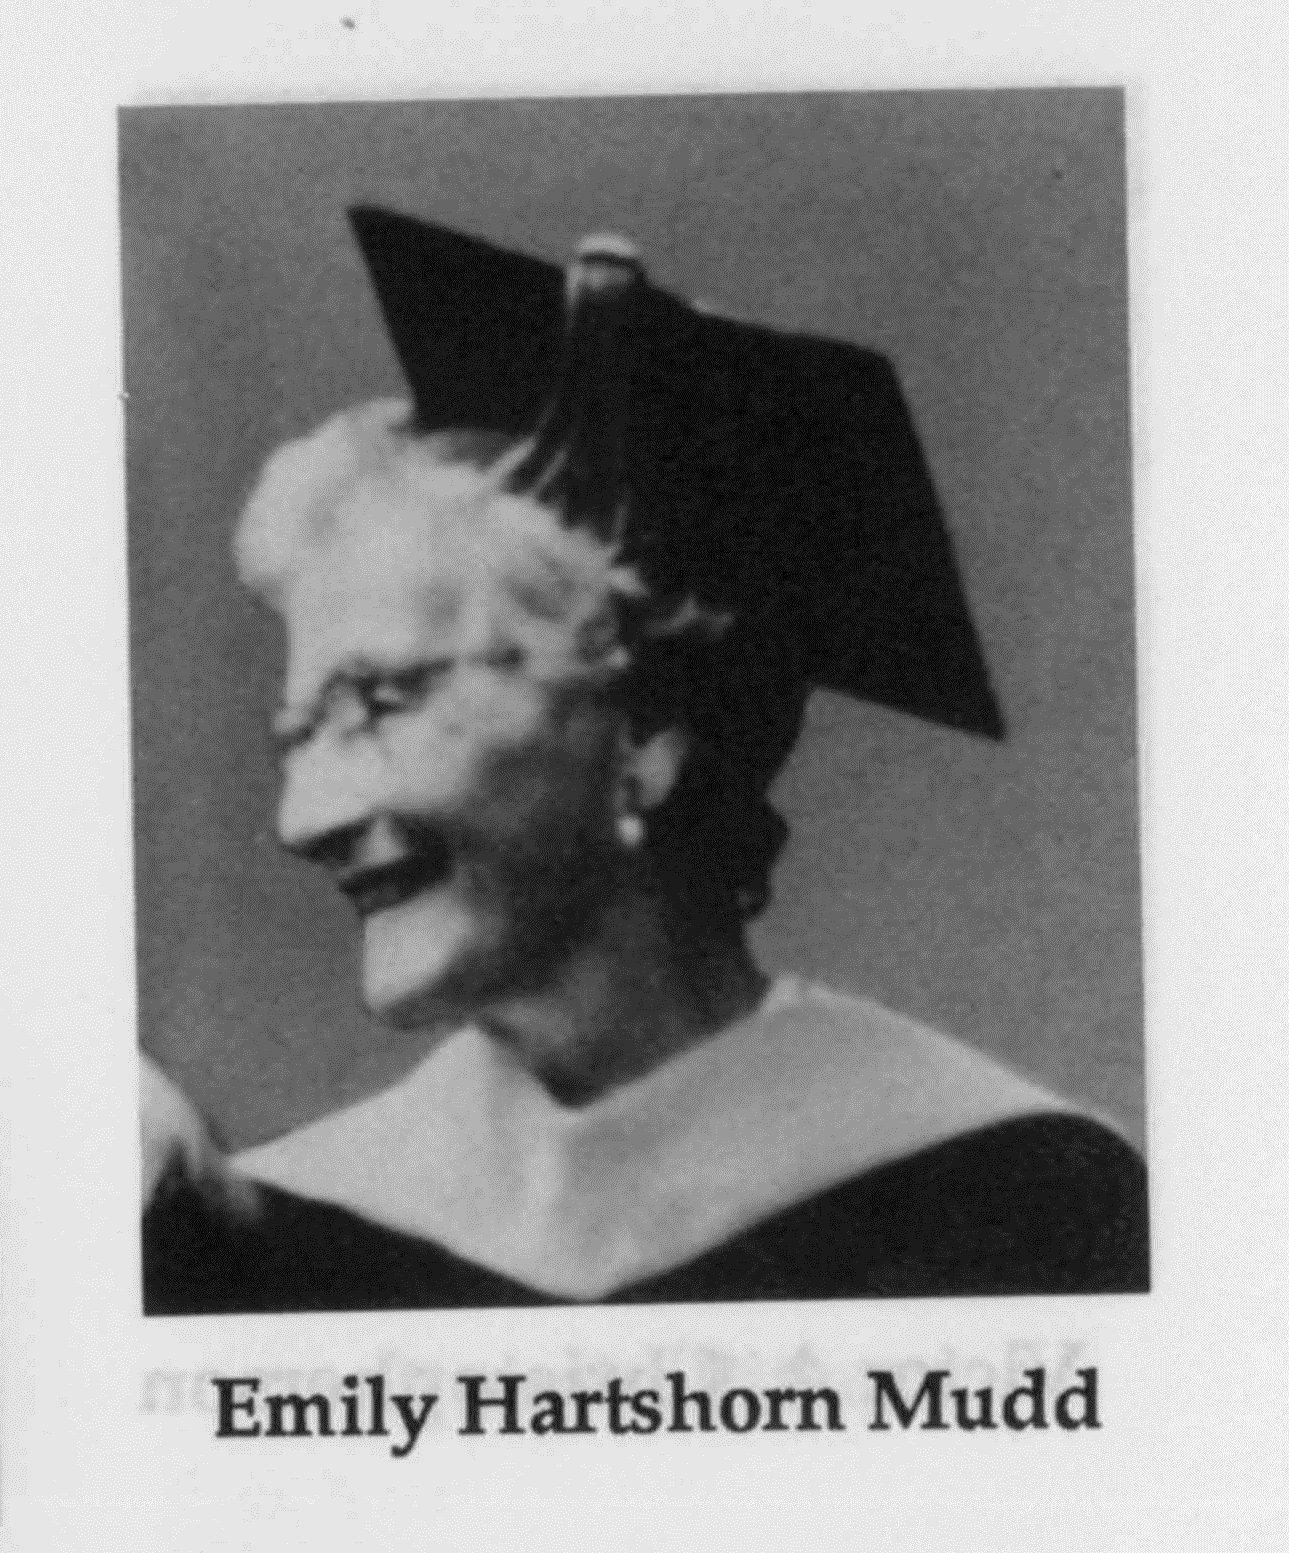 Emily Hartshorn Mudd